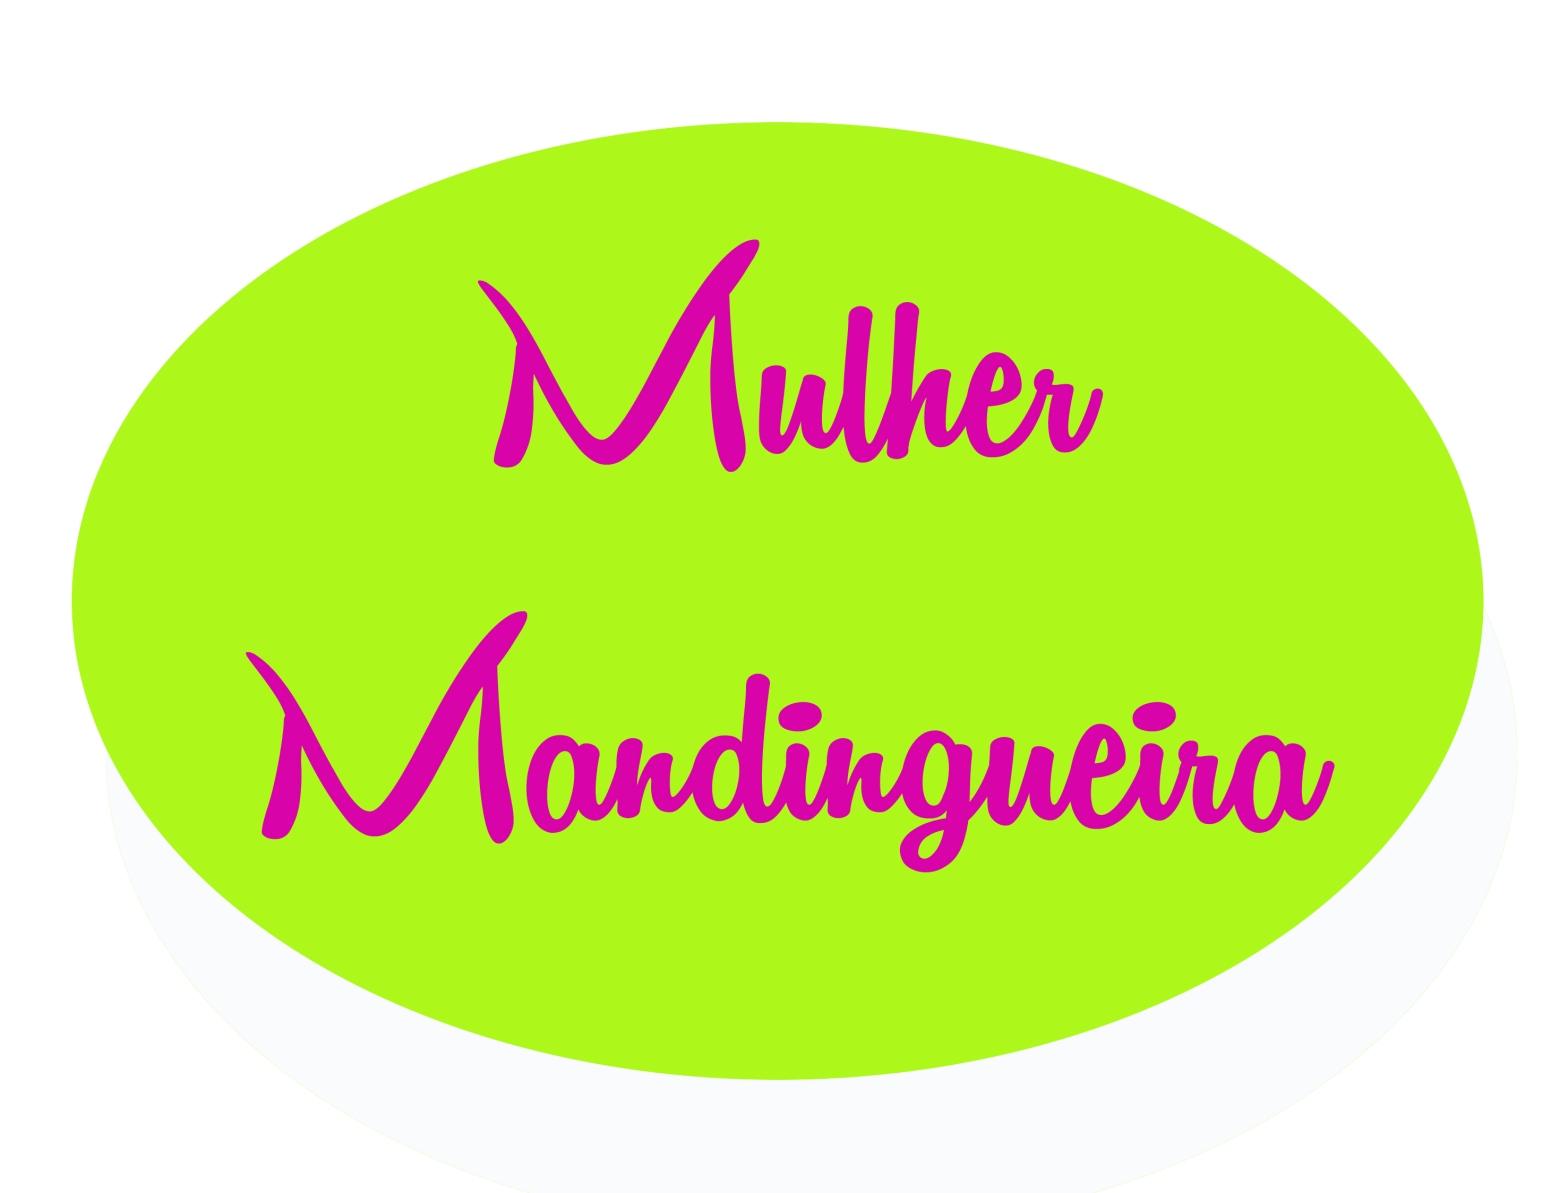 Mulher_mandigueira_capoeira_bichodacapoeira